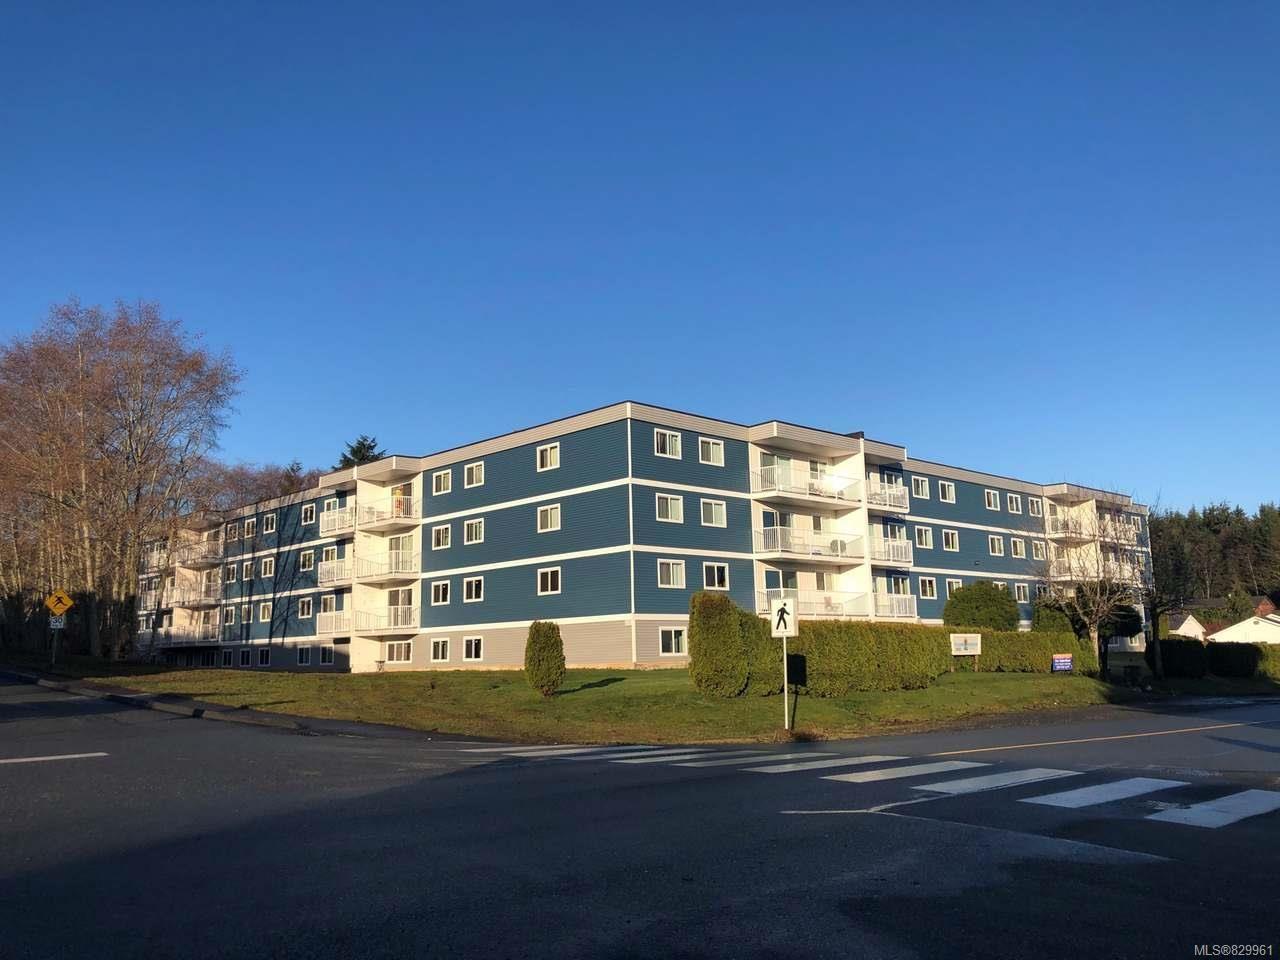 Main Photo: 107 7450 Rupert St in PORT HARDY: NI Port Hardy Condo for sale (North Island)  : MLS®# 829961